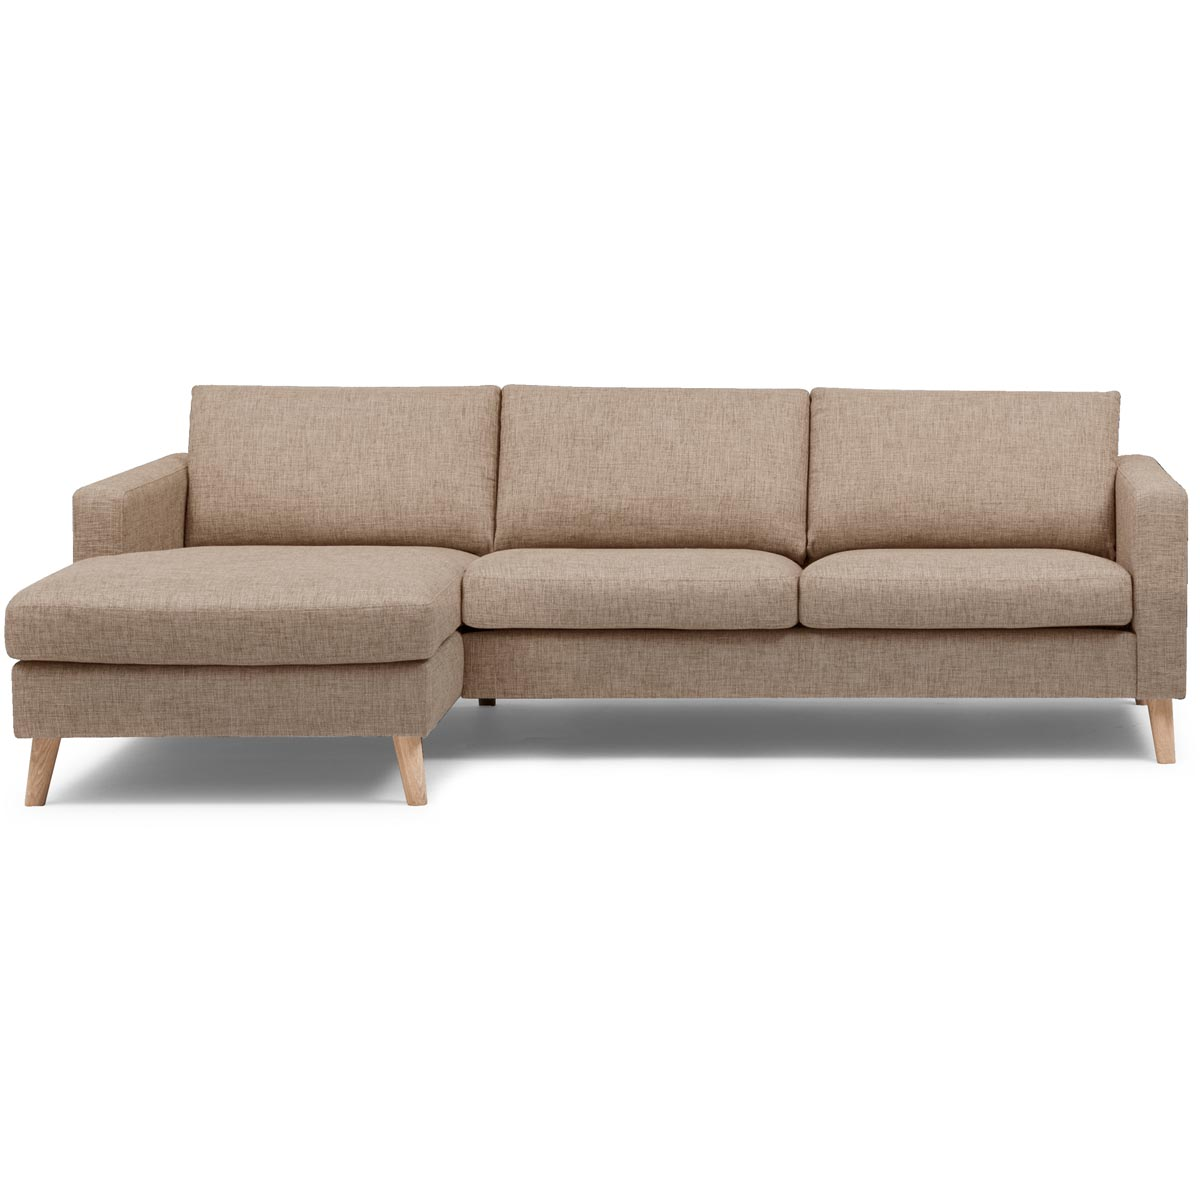 Vaddo-3Div-soffa-Deligth-beige